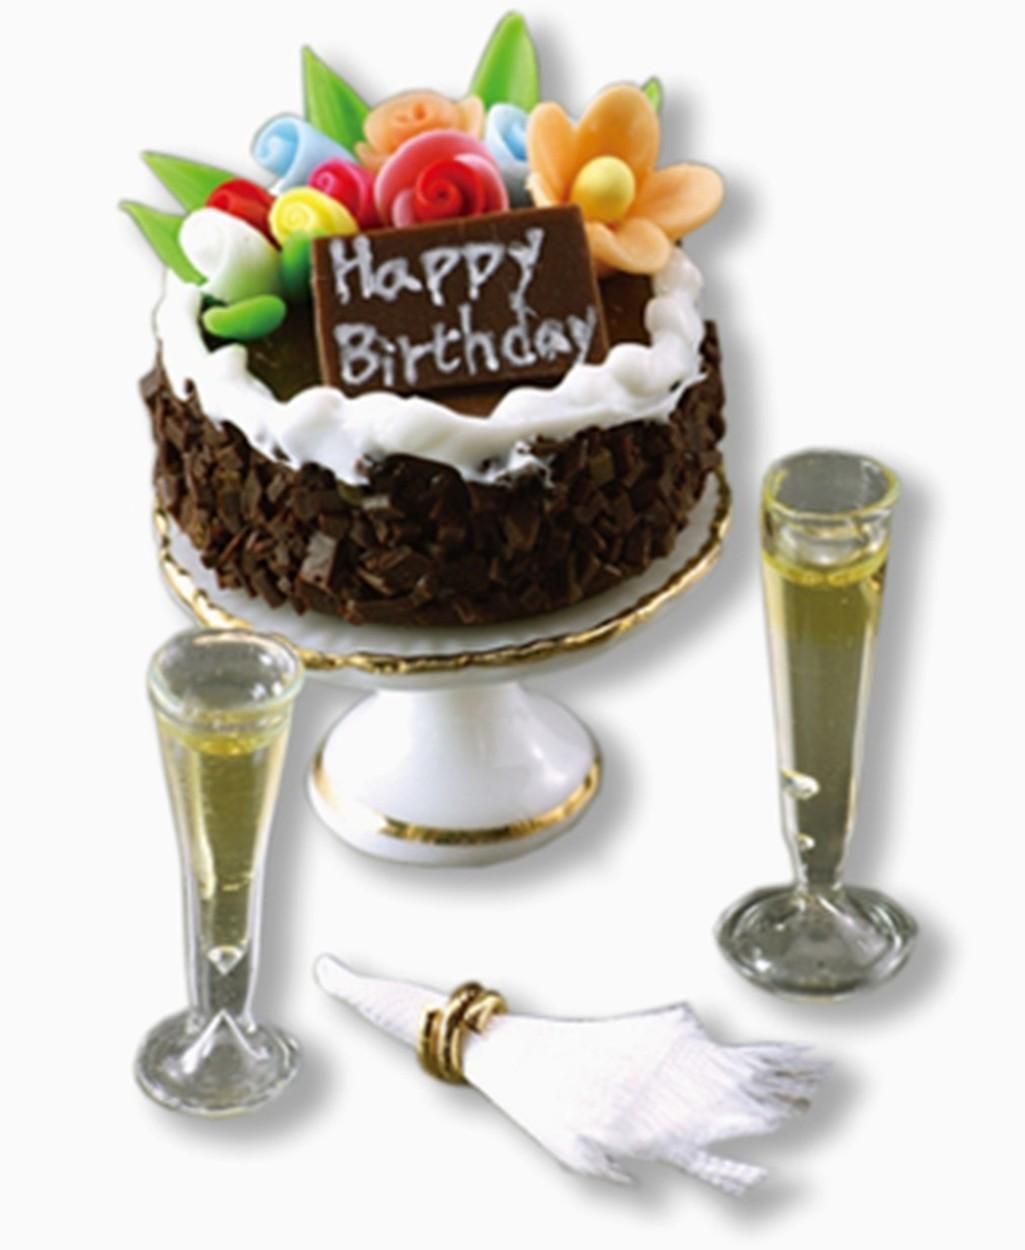 Champagne Birthday Toast | www.pixshark.com - Images ...